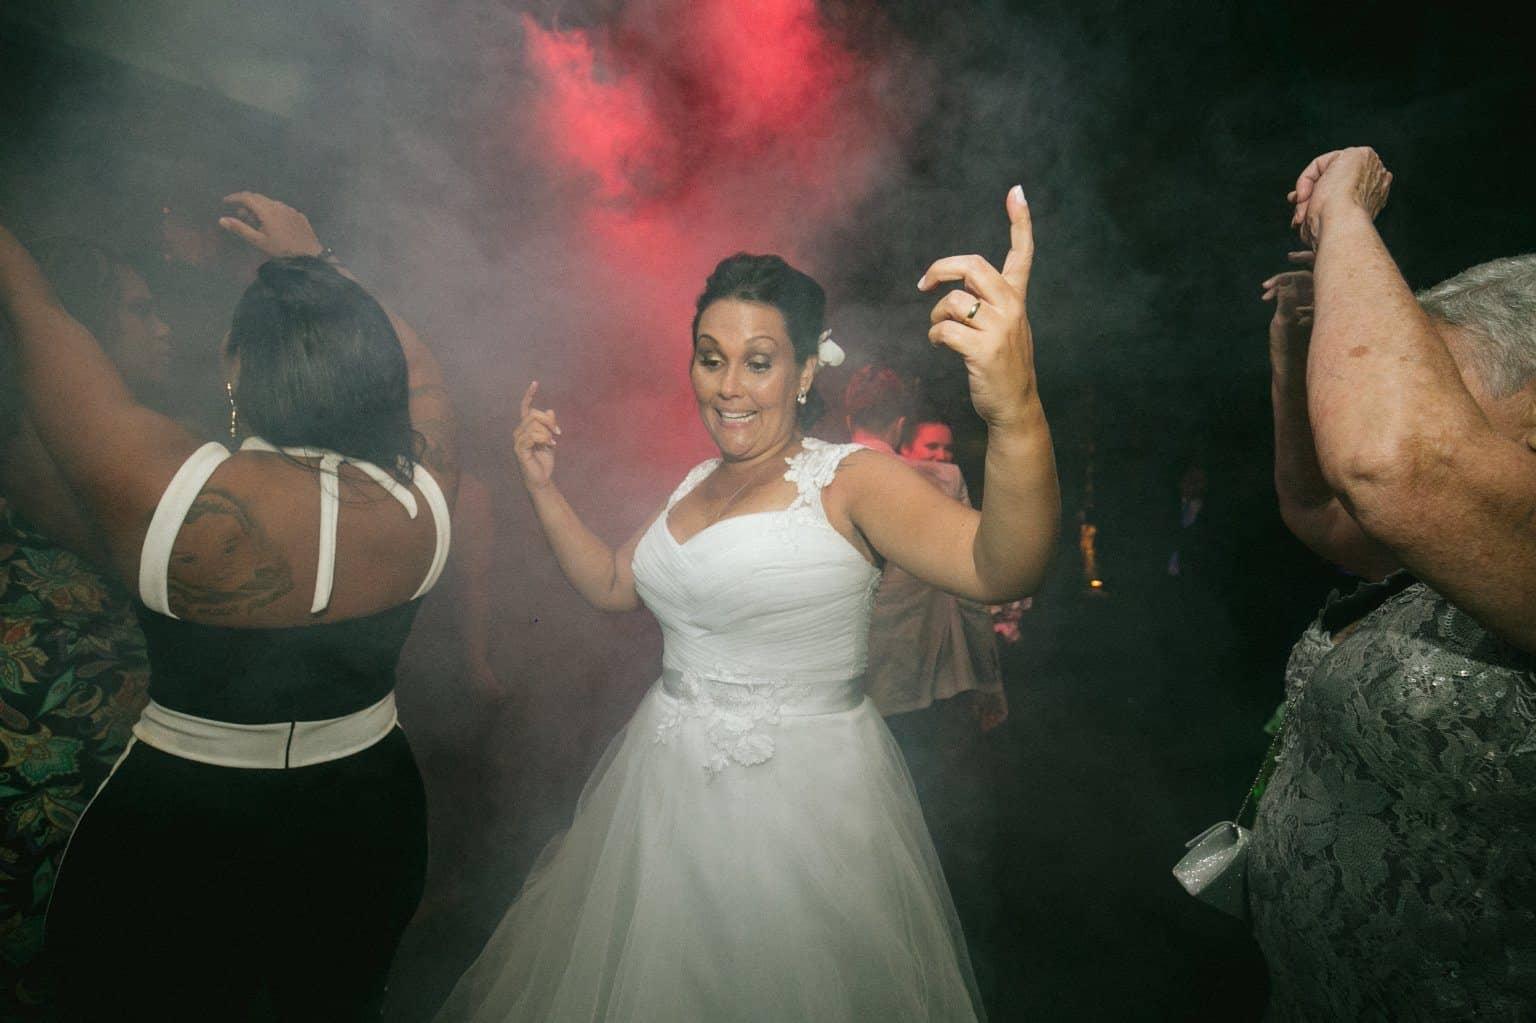 casamento-karina-e-marcos-felizes-para-sempre-caseme-2